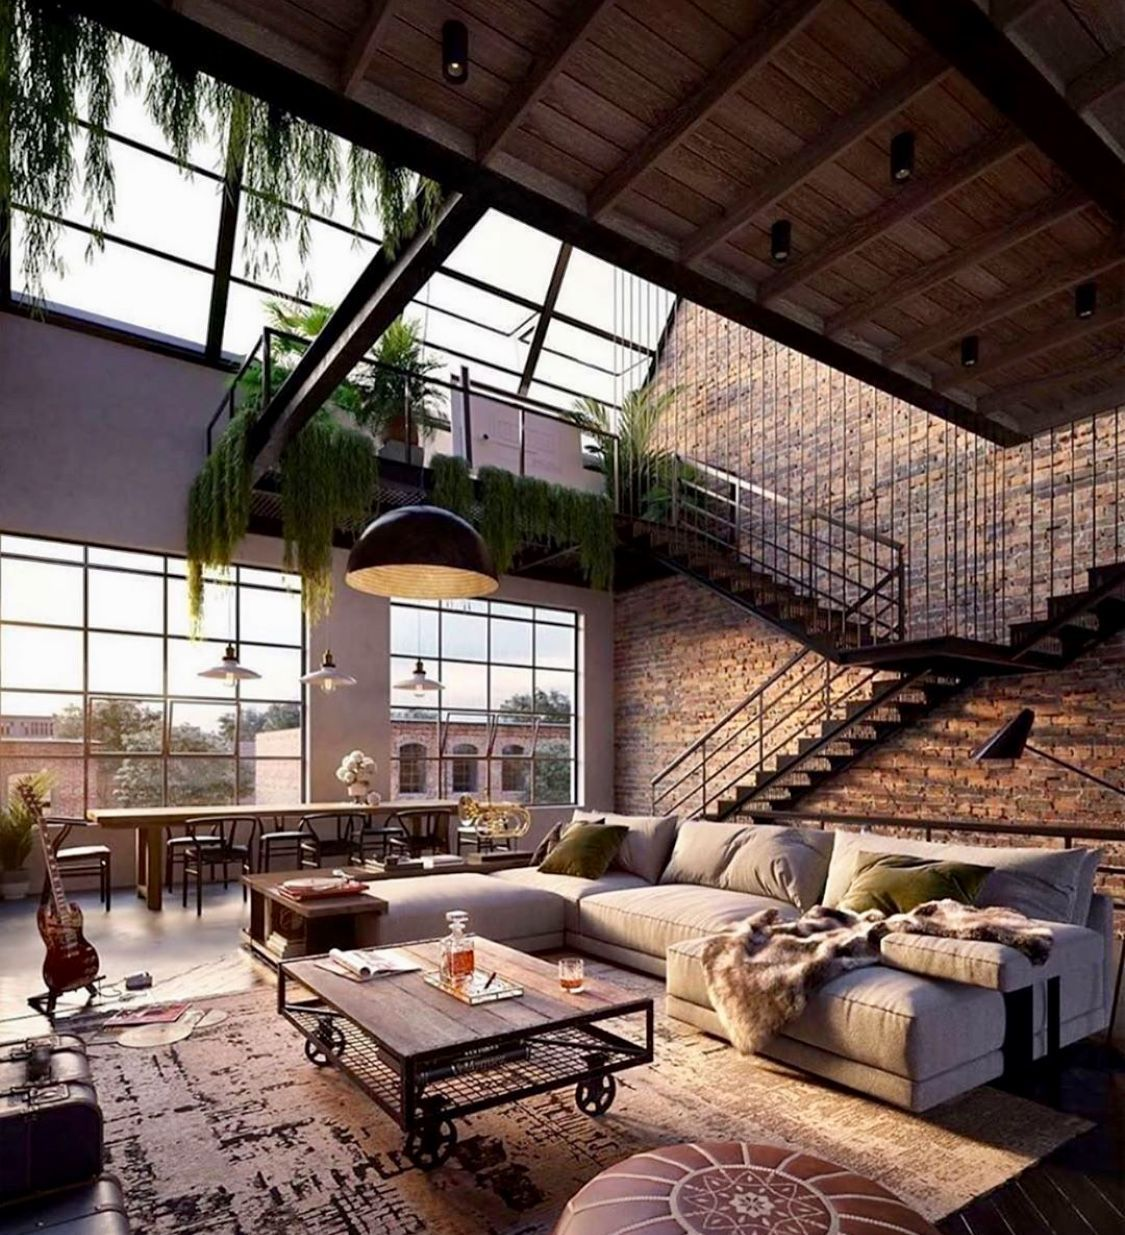 Cheap Loft Apartments: Cheap Gold Decor - SalePrice:30$ In 2020